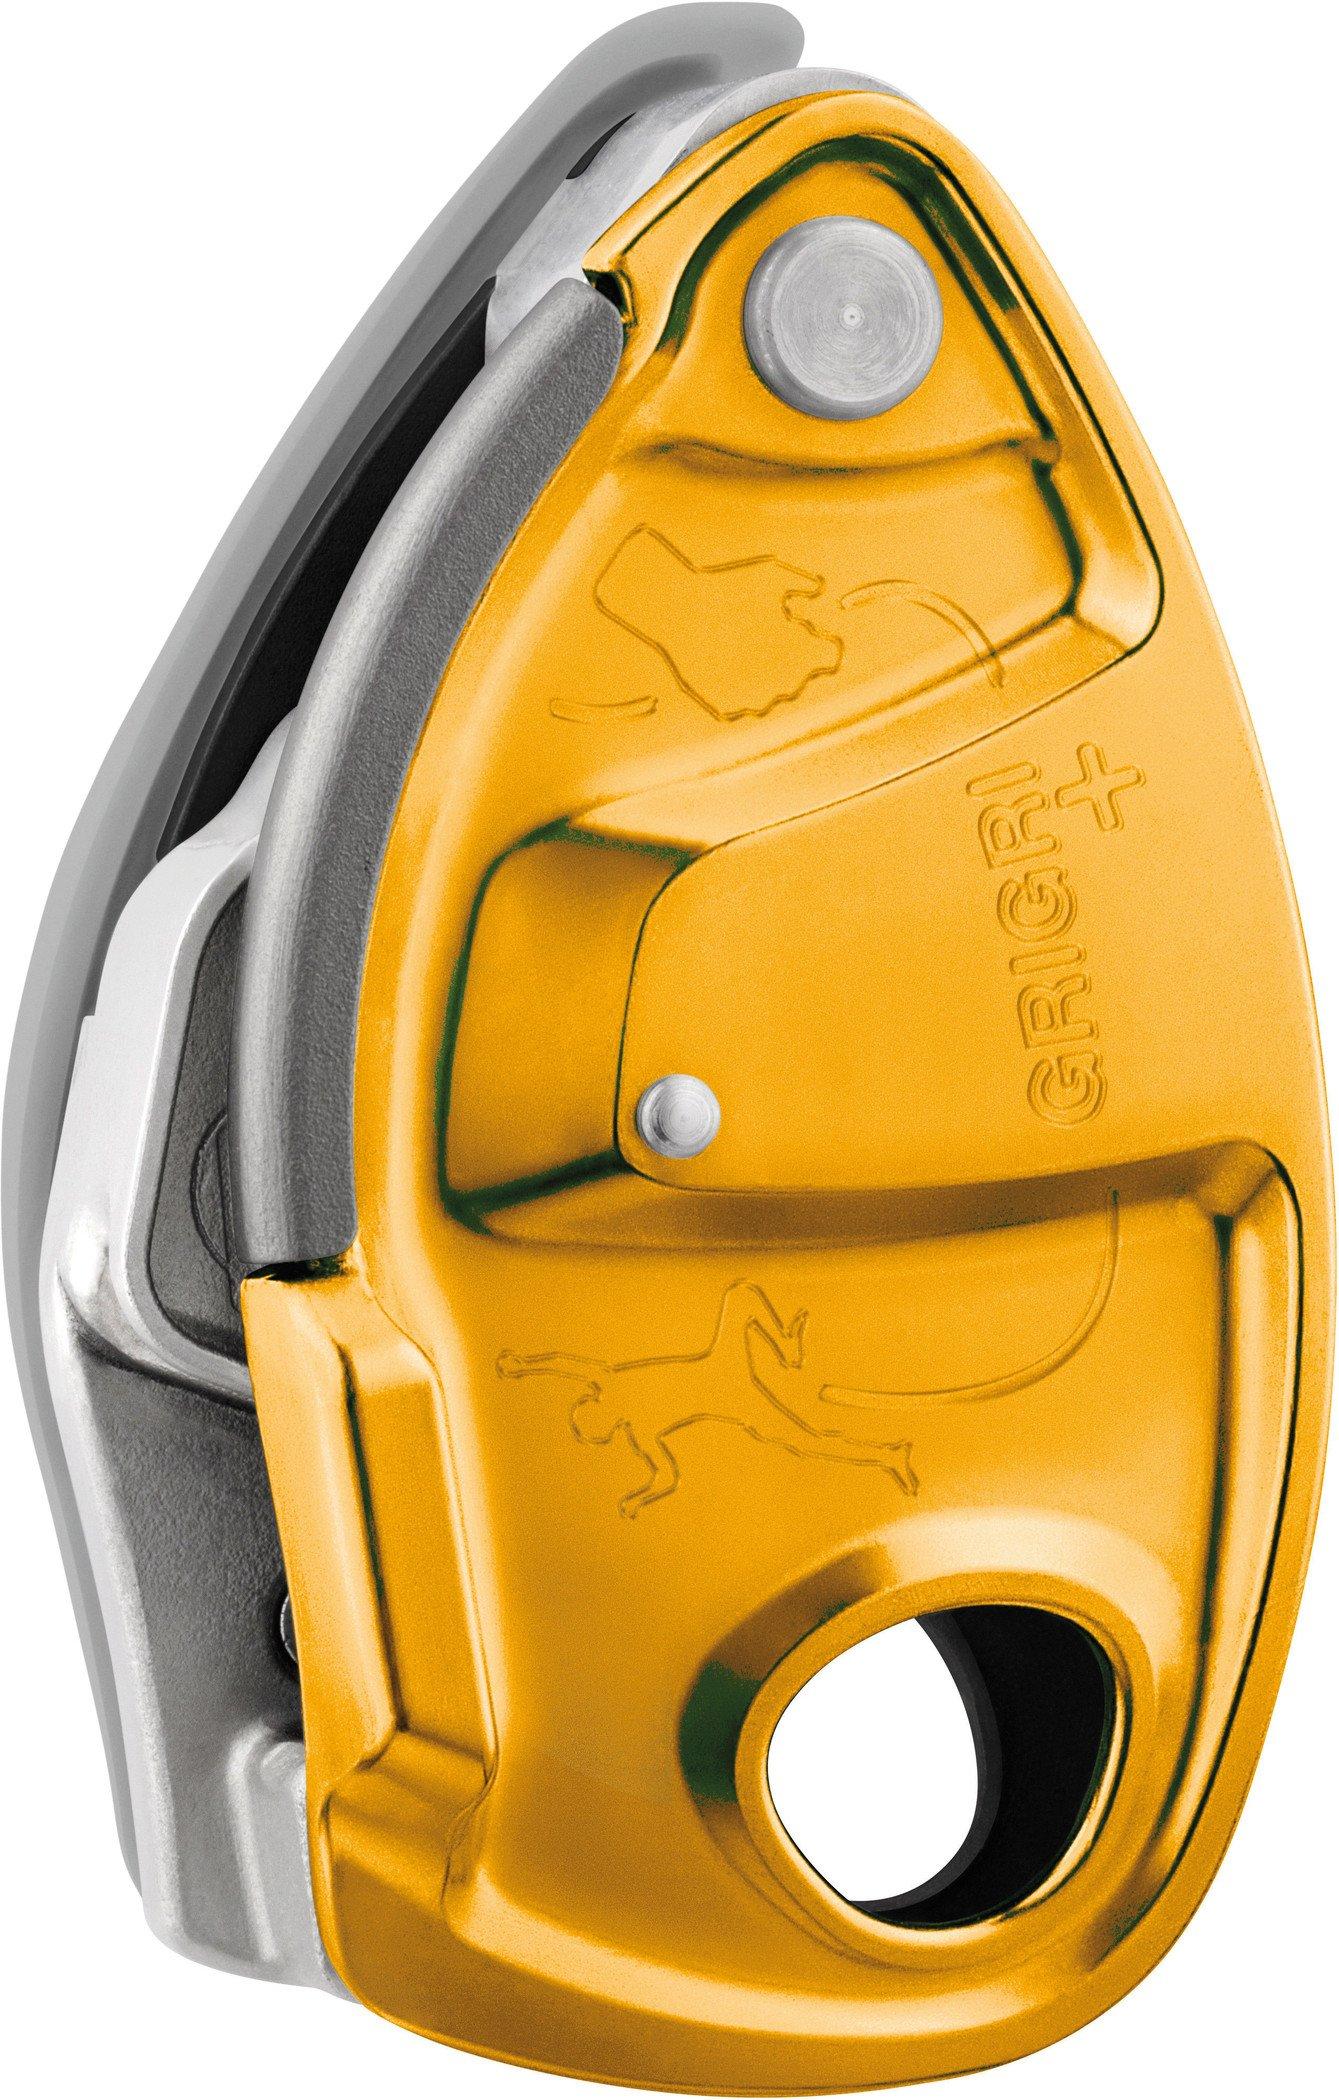 PETZL Grigri Plus Belay Device - AW19 - One - Orange by PETZL